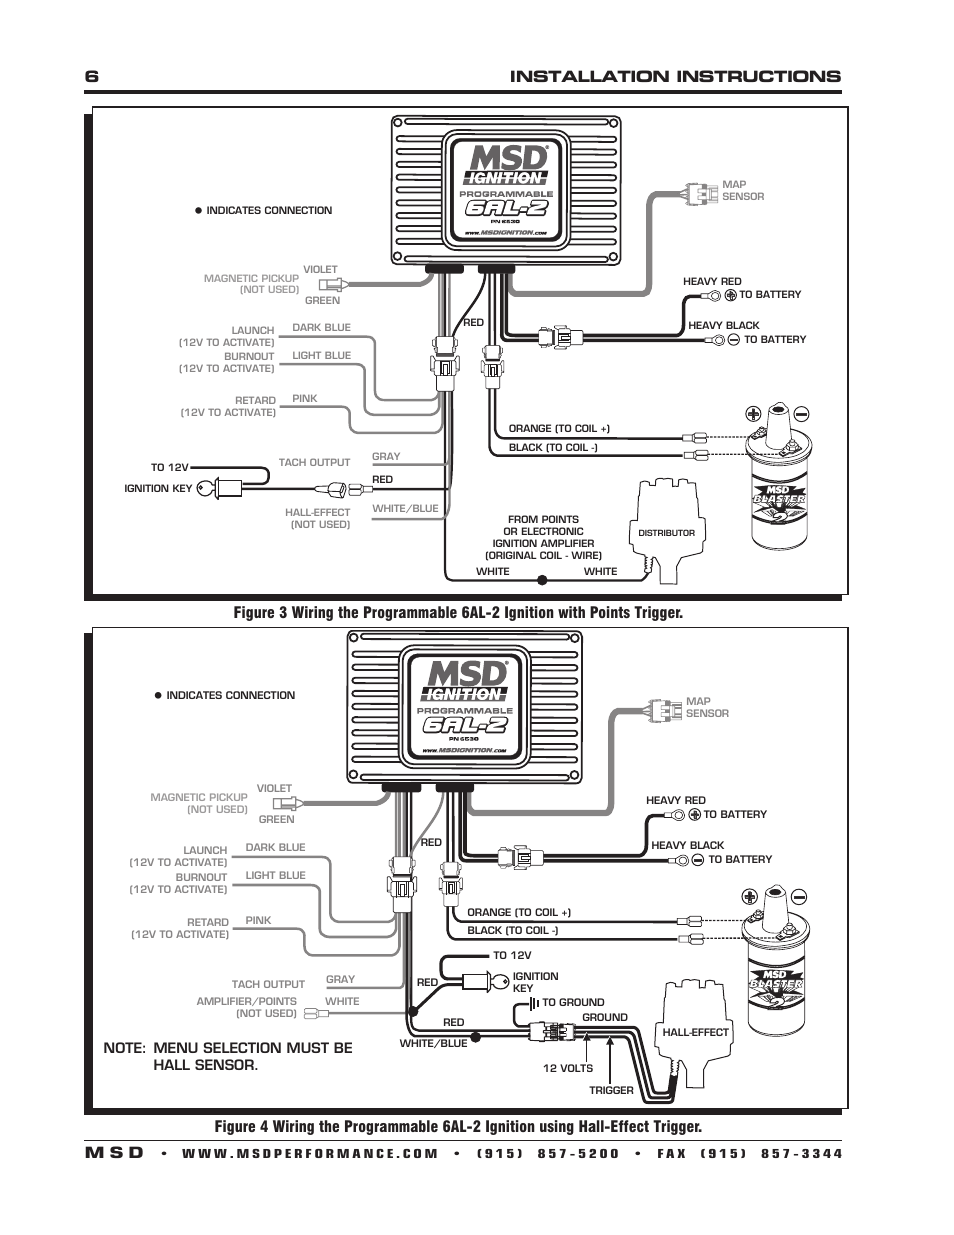 hight resolution of msd 6al 2 wiring diagram 6530 wiring diagram forward6installation instructions m s d msd 6530 digital programmable 6al